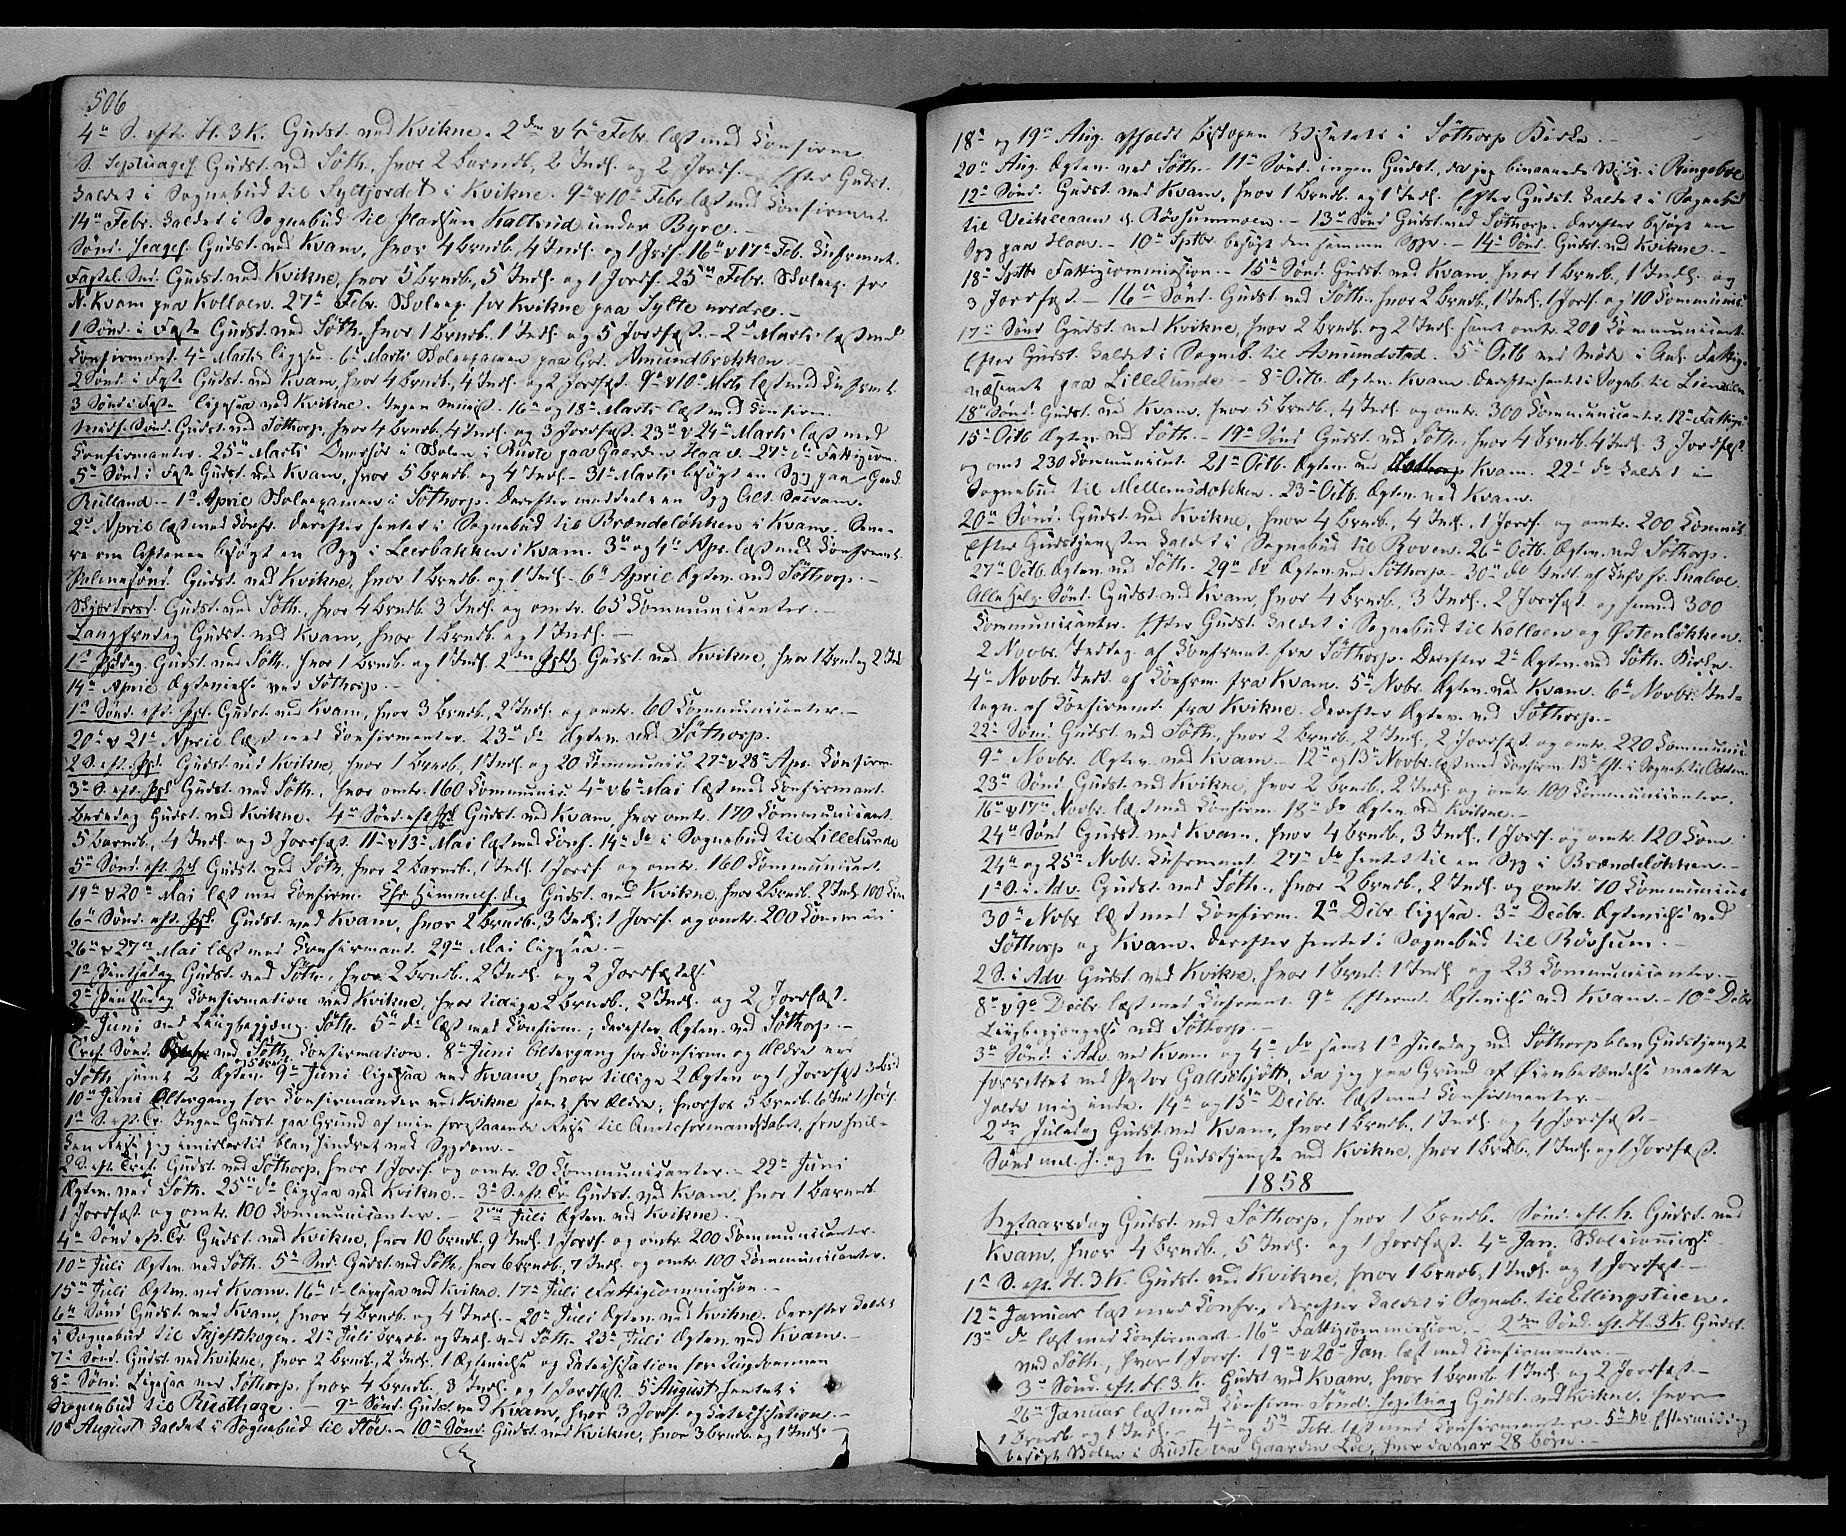 SAH, Nord-Fron prestekontor, Ministerialbok nr. 1, 1851-1864, s. 506